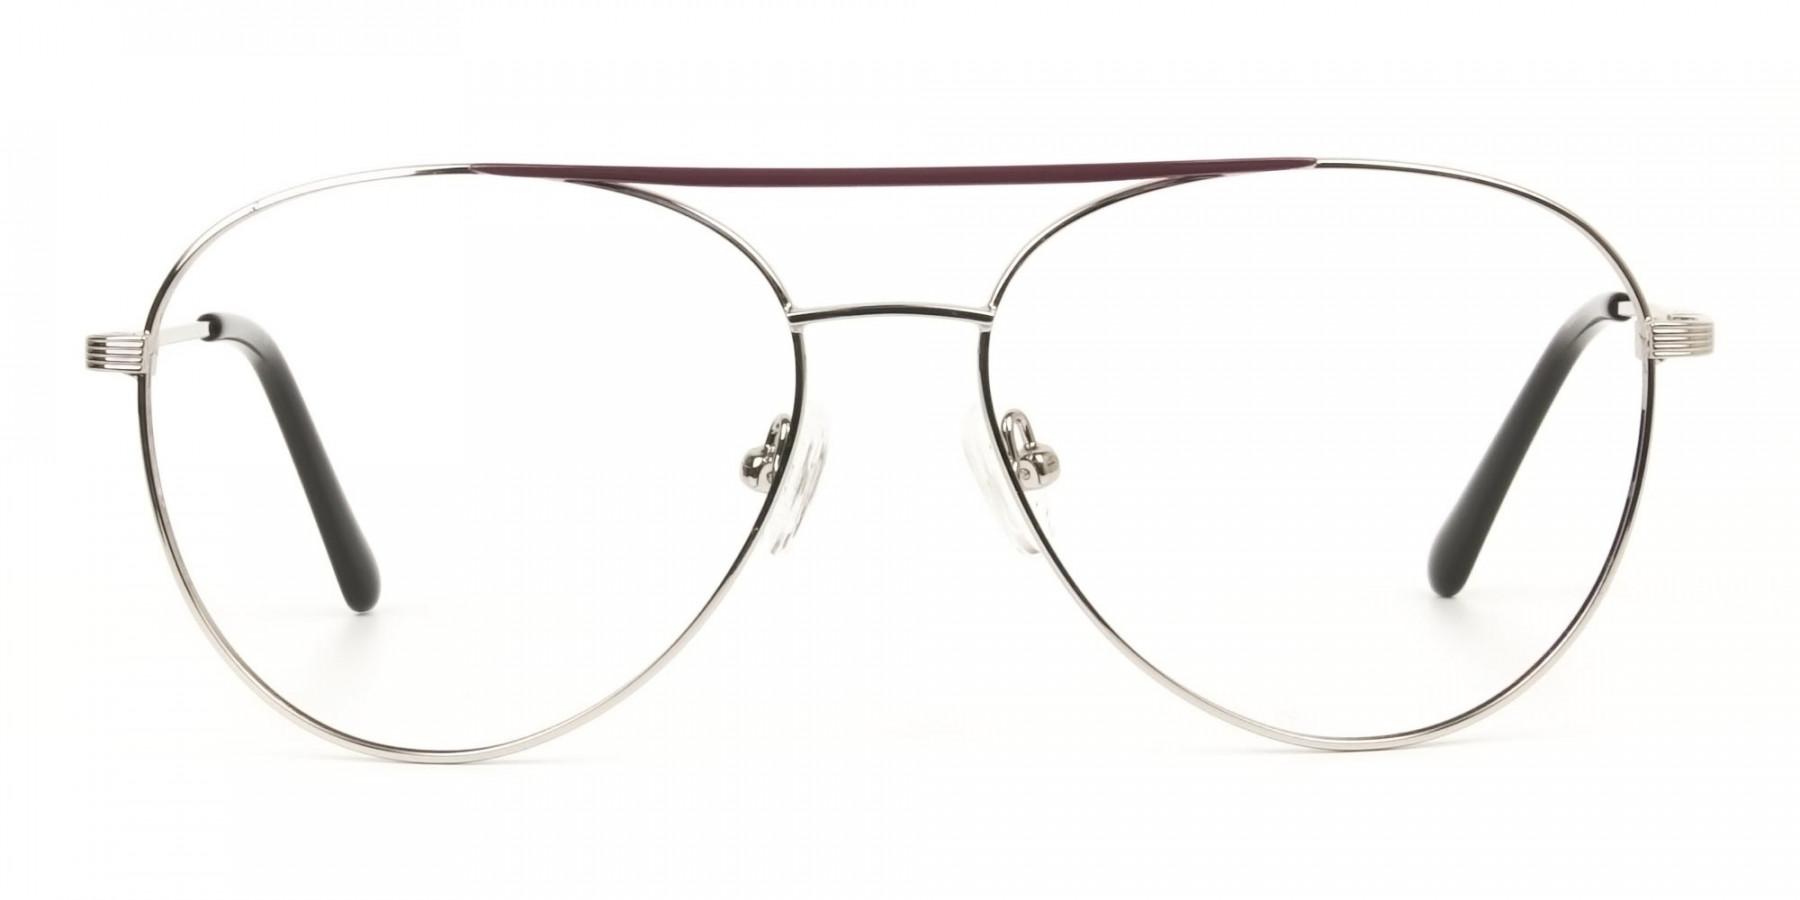 Silver and Brown Flat Bridge Aviator Glasses - 1